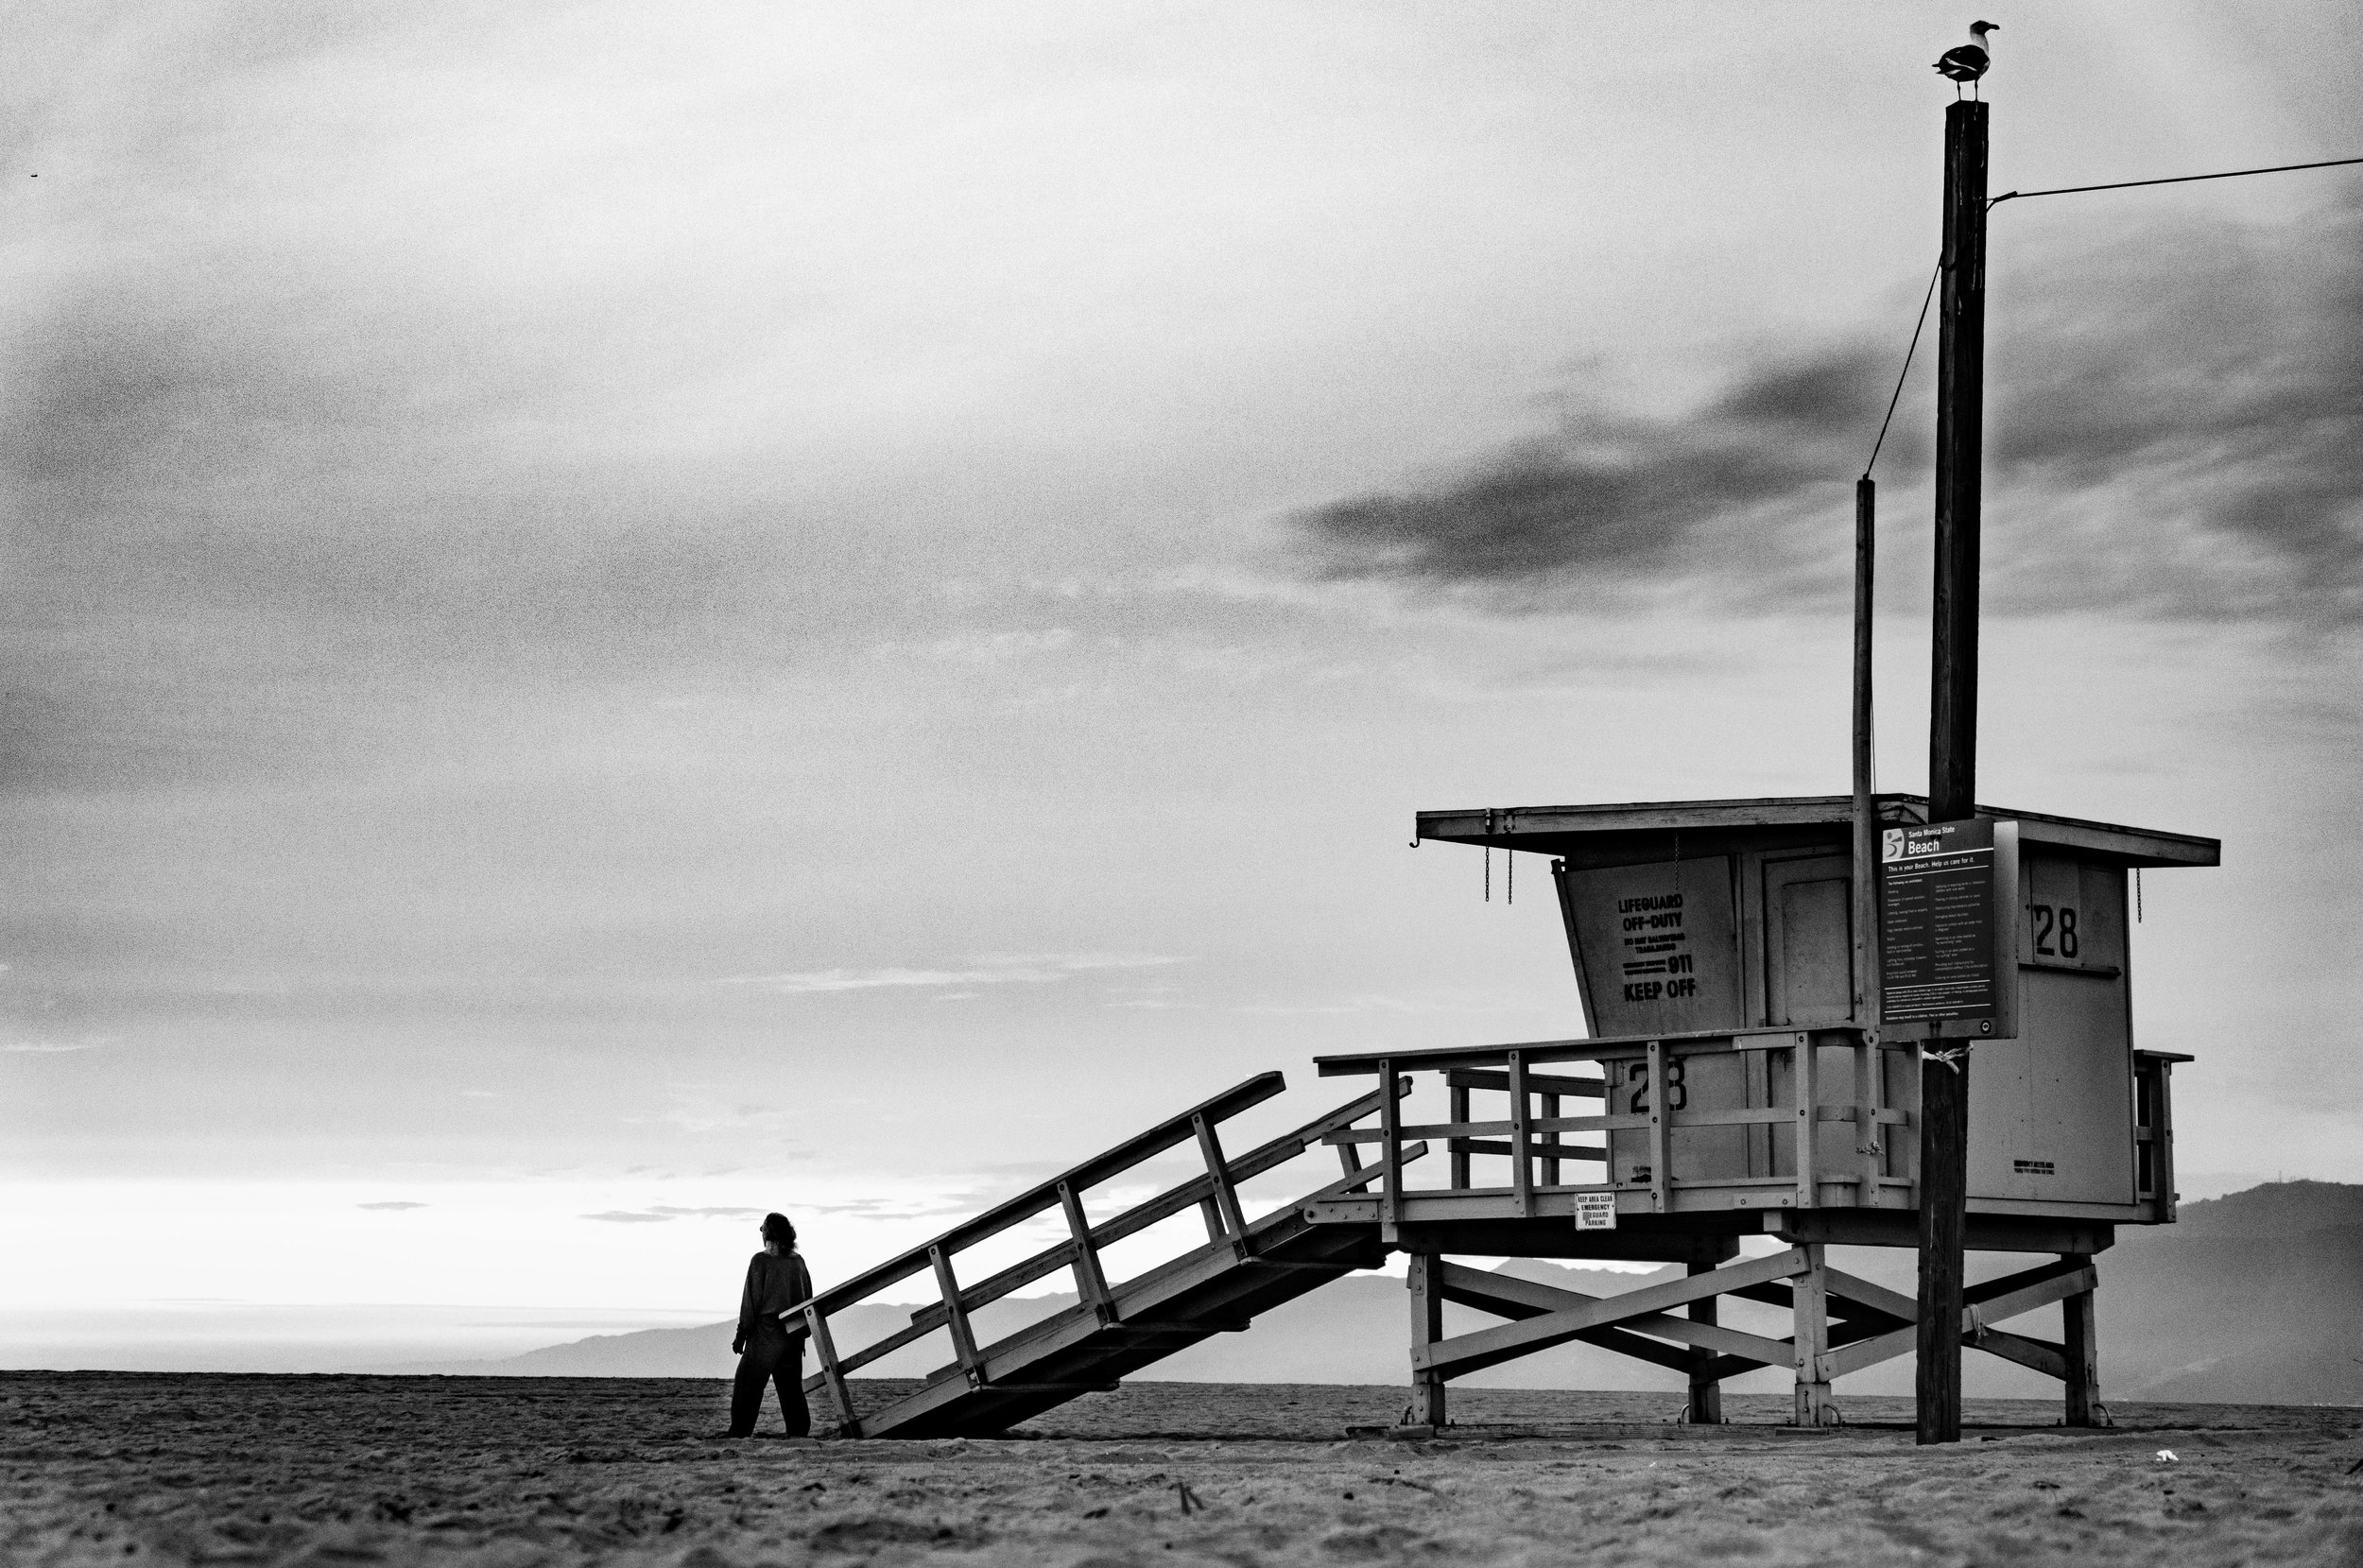 Day-2-Venice-Beach.jpg